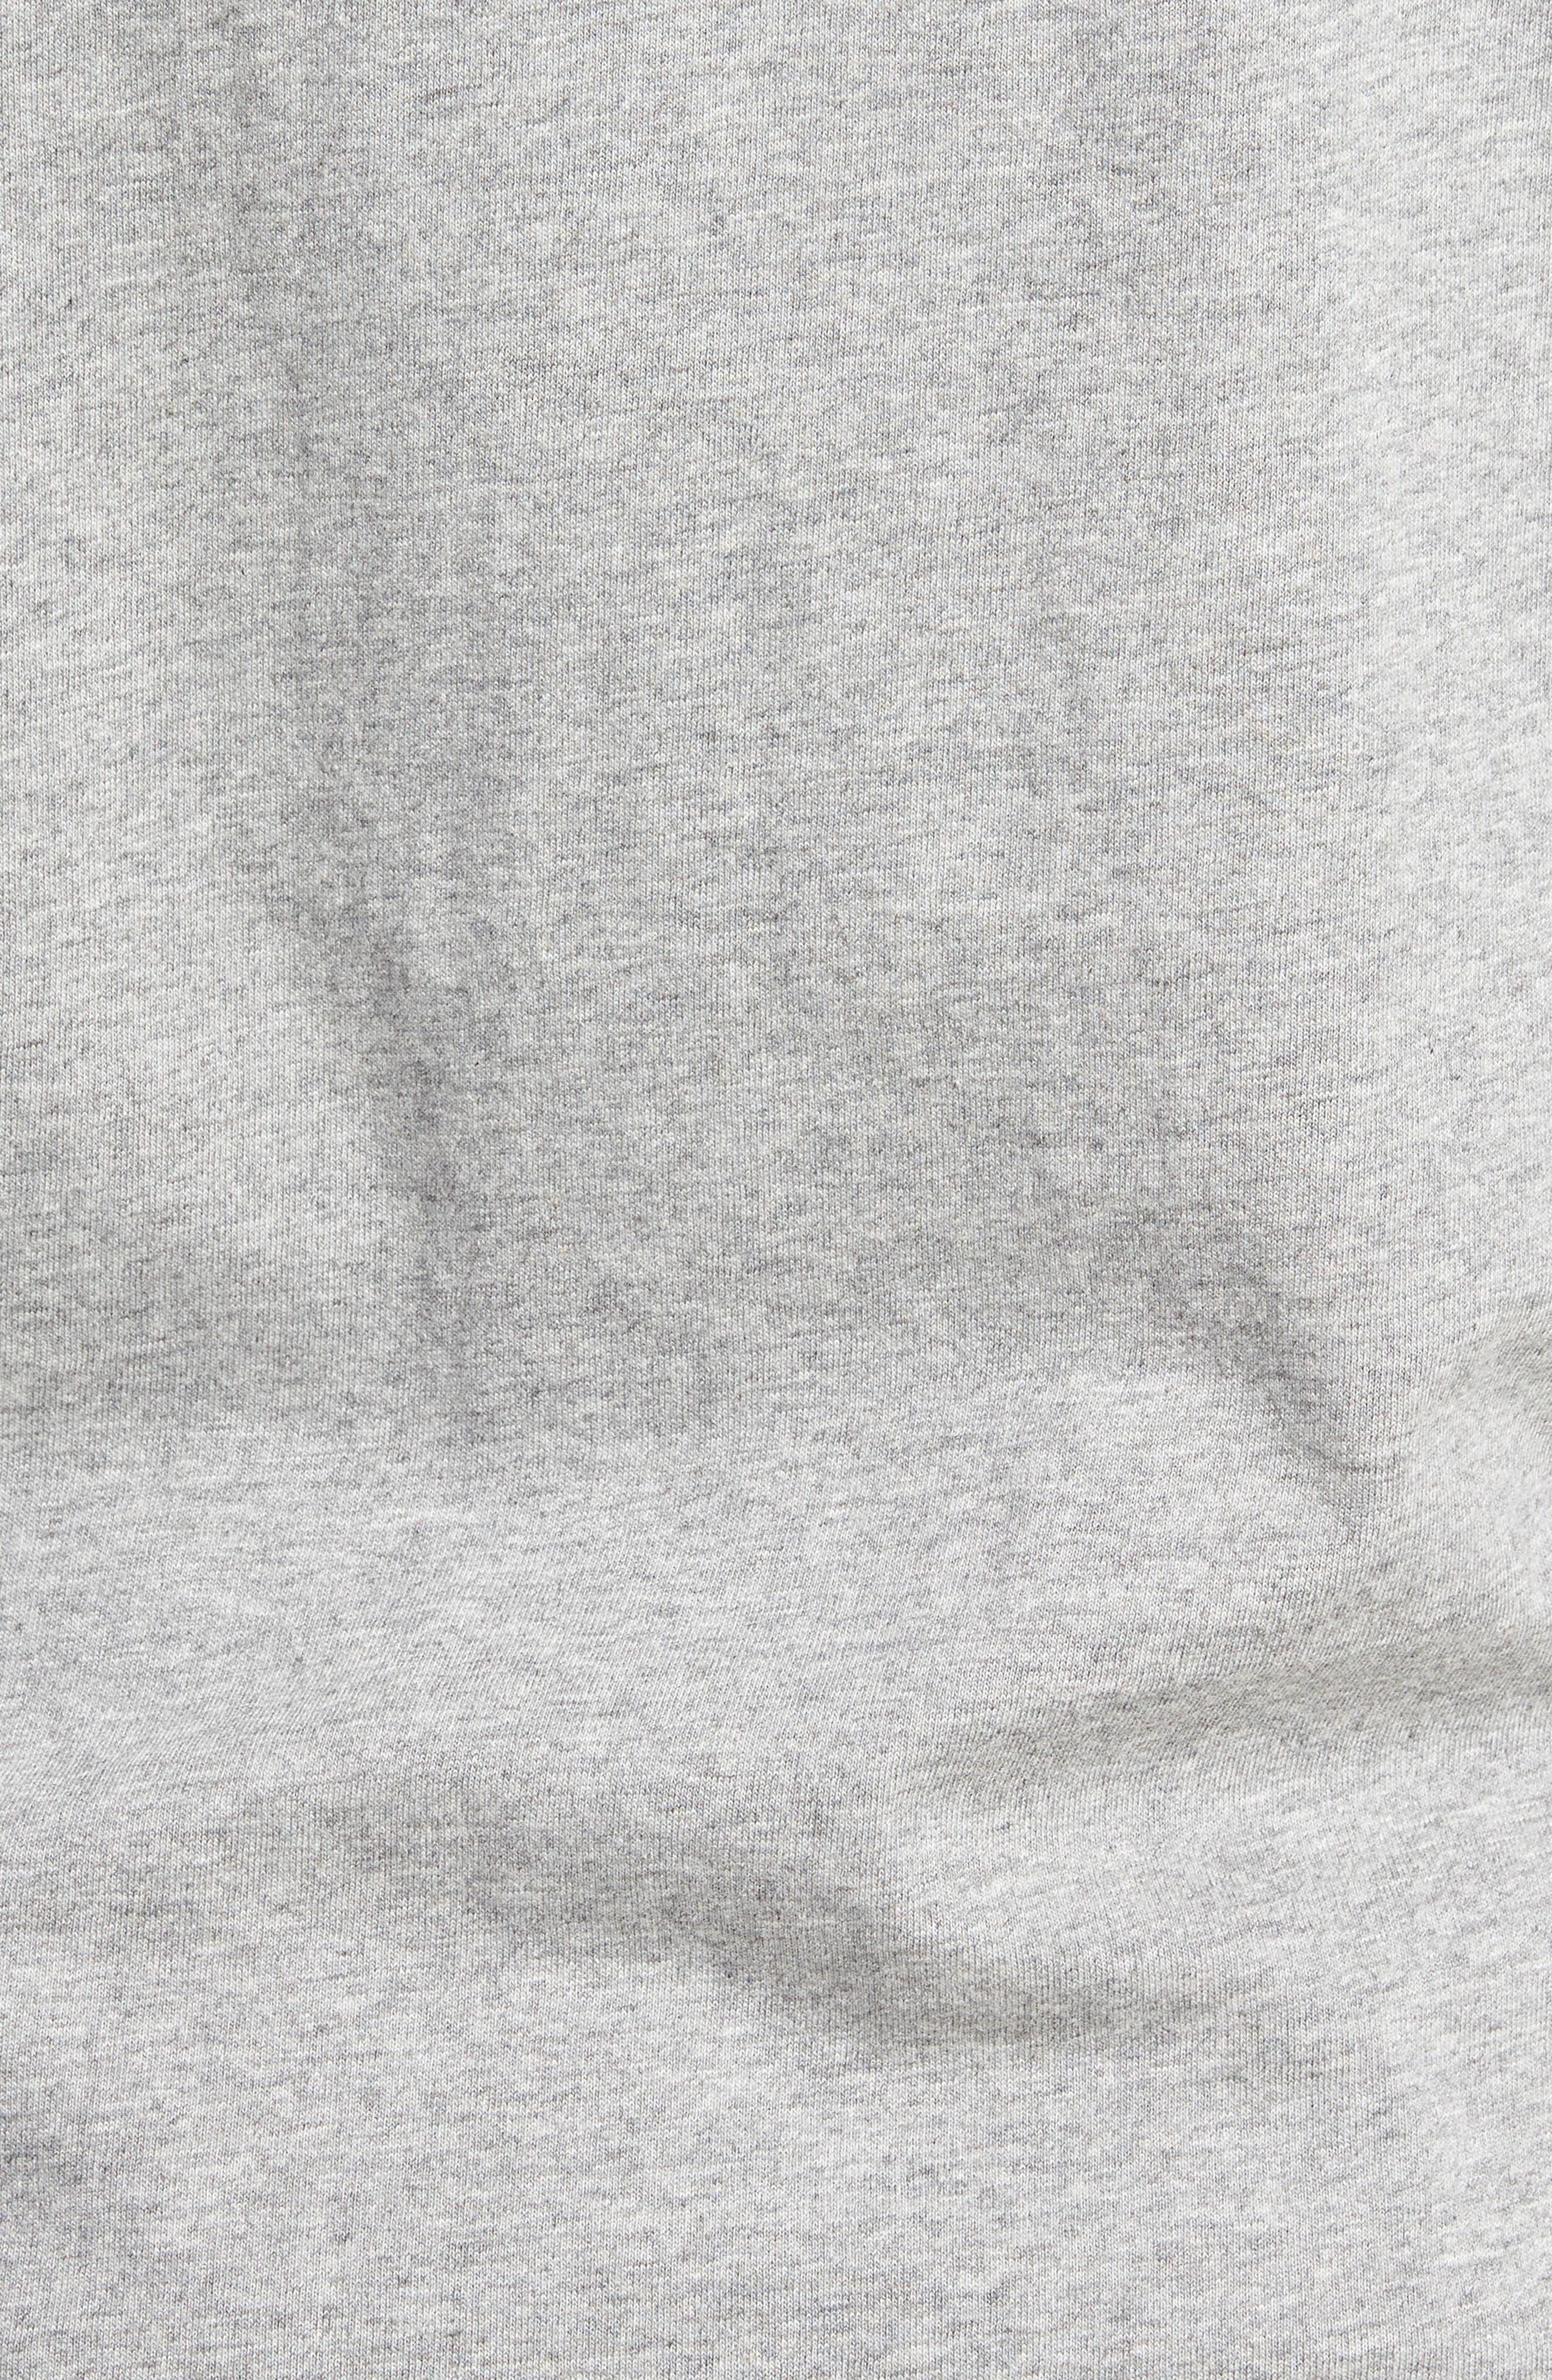 Van Doren Hooded T-Shirt,                             Alternate thumbnail 5, color,                             Cement Heather/ Dress Blues